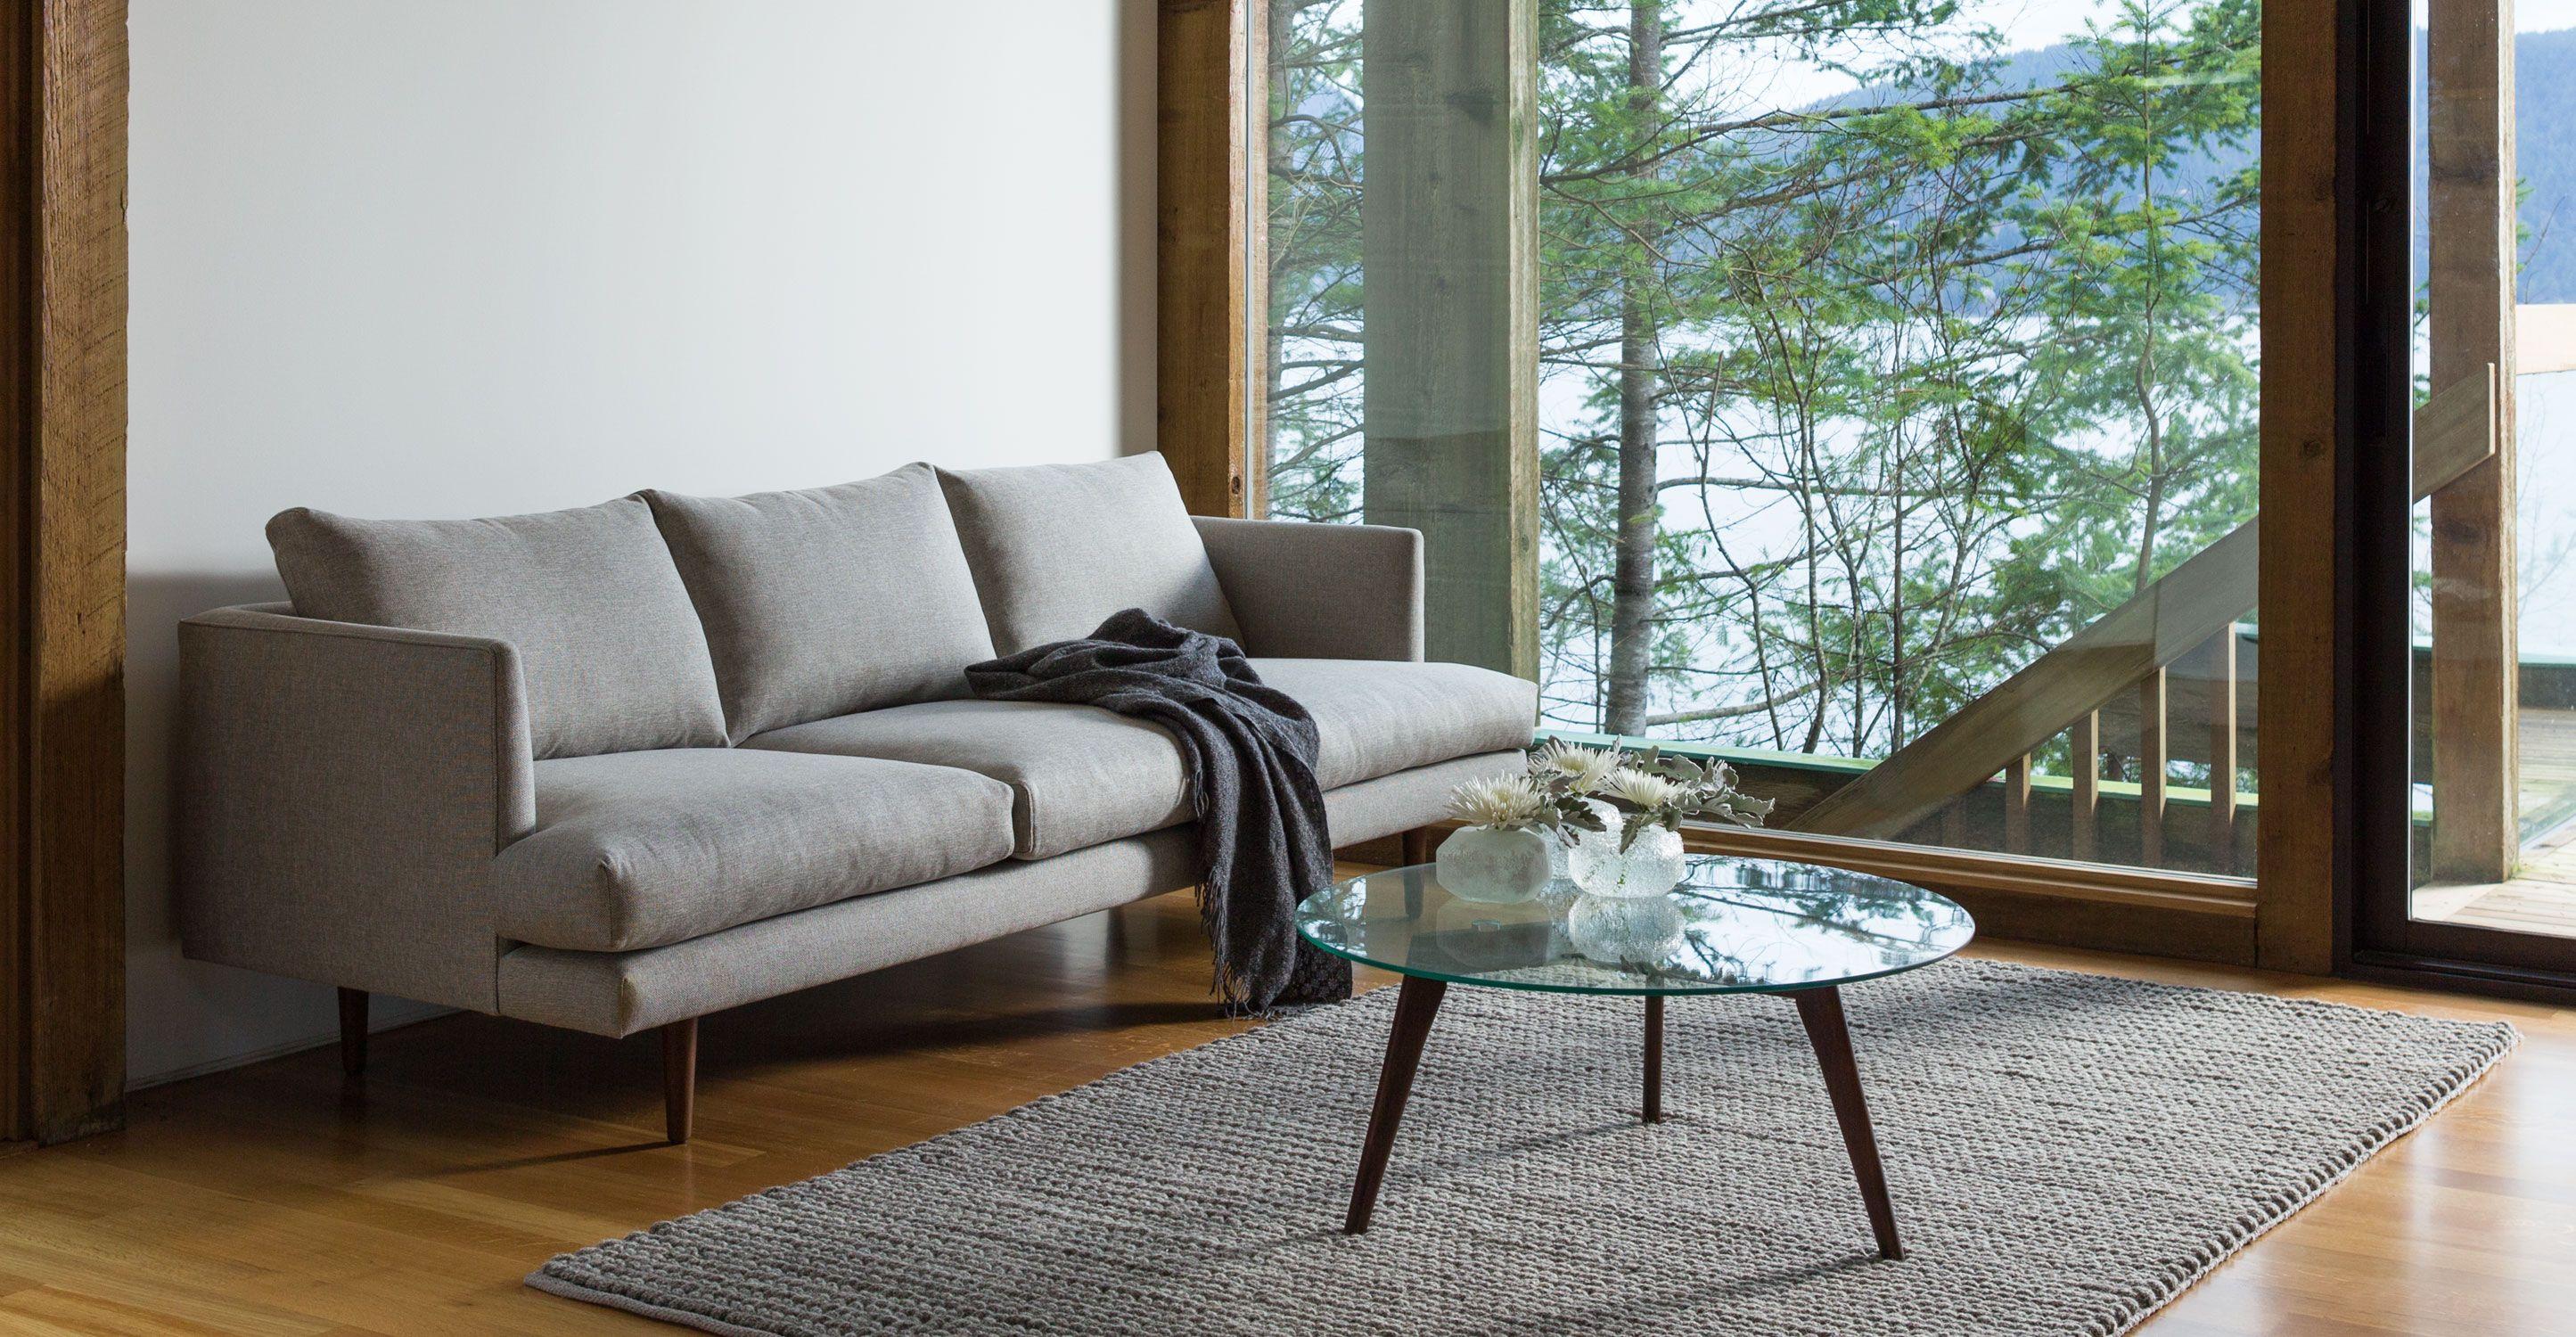 Light Gray Sofa 3 Seater Solid Wood Legs